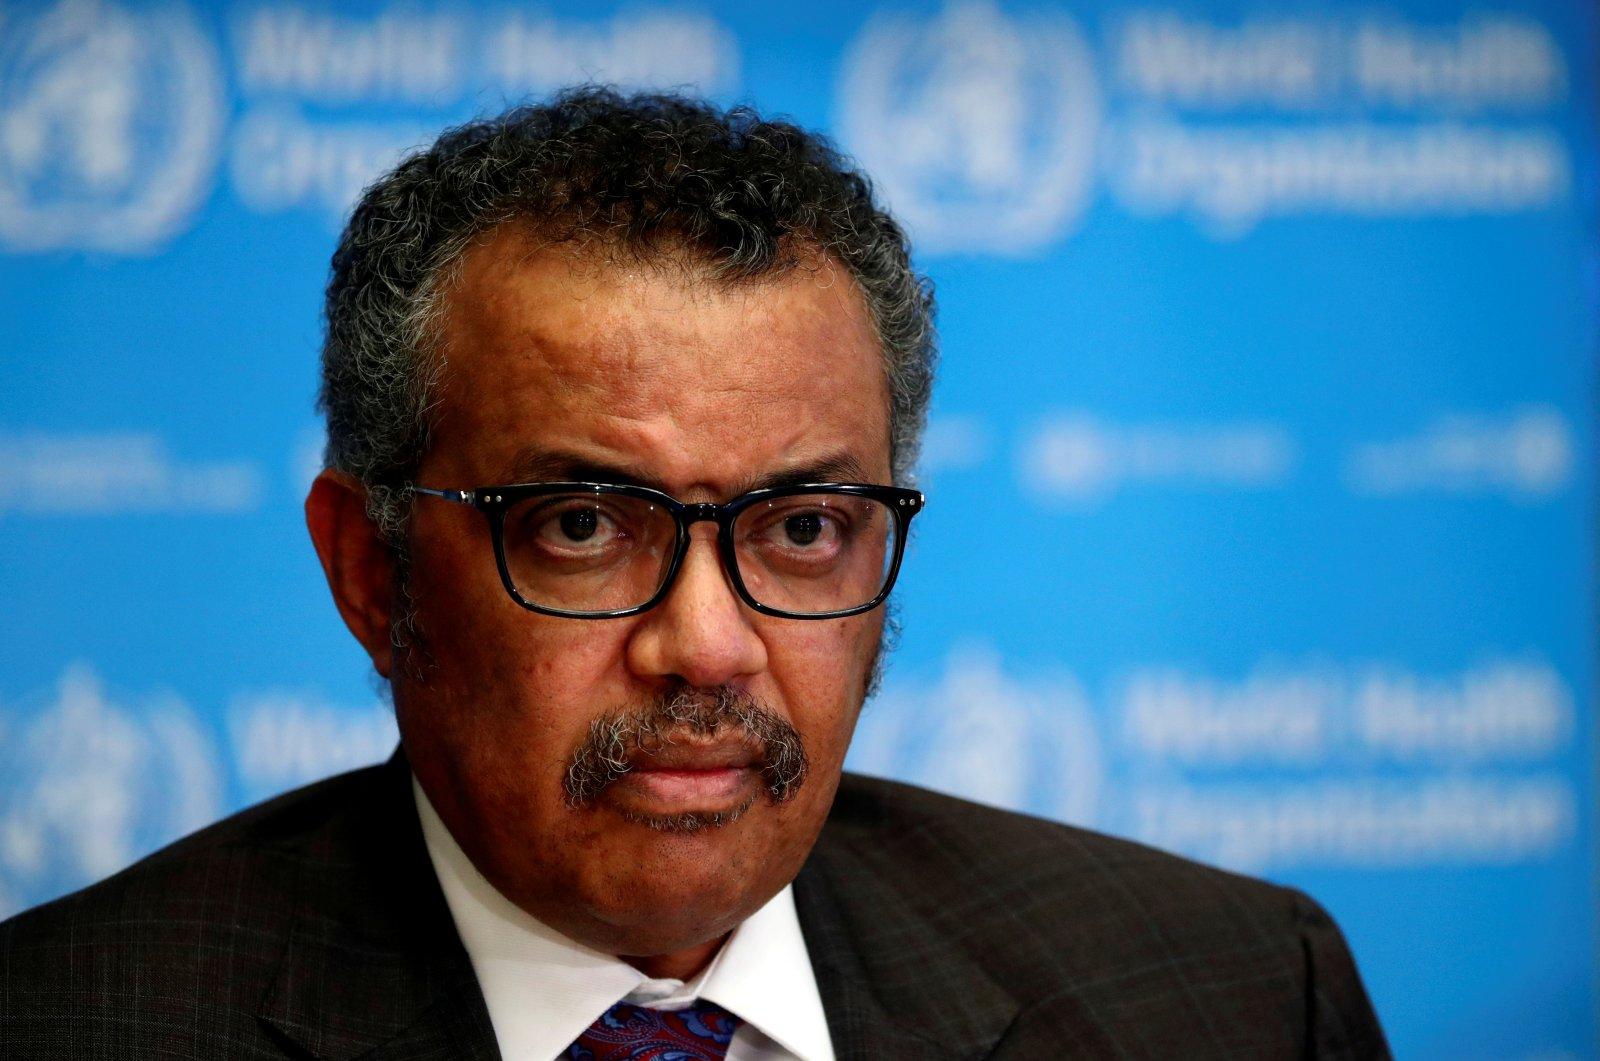 Director-General of the World Health Organization (WHO) Tedros Adhanom Ghebreyesus attends a news conference, Geneva, Switzerland, Feb. 28, 2020. (Reuters Photo)